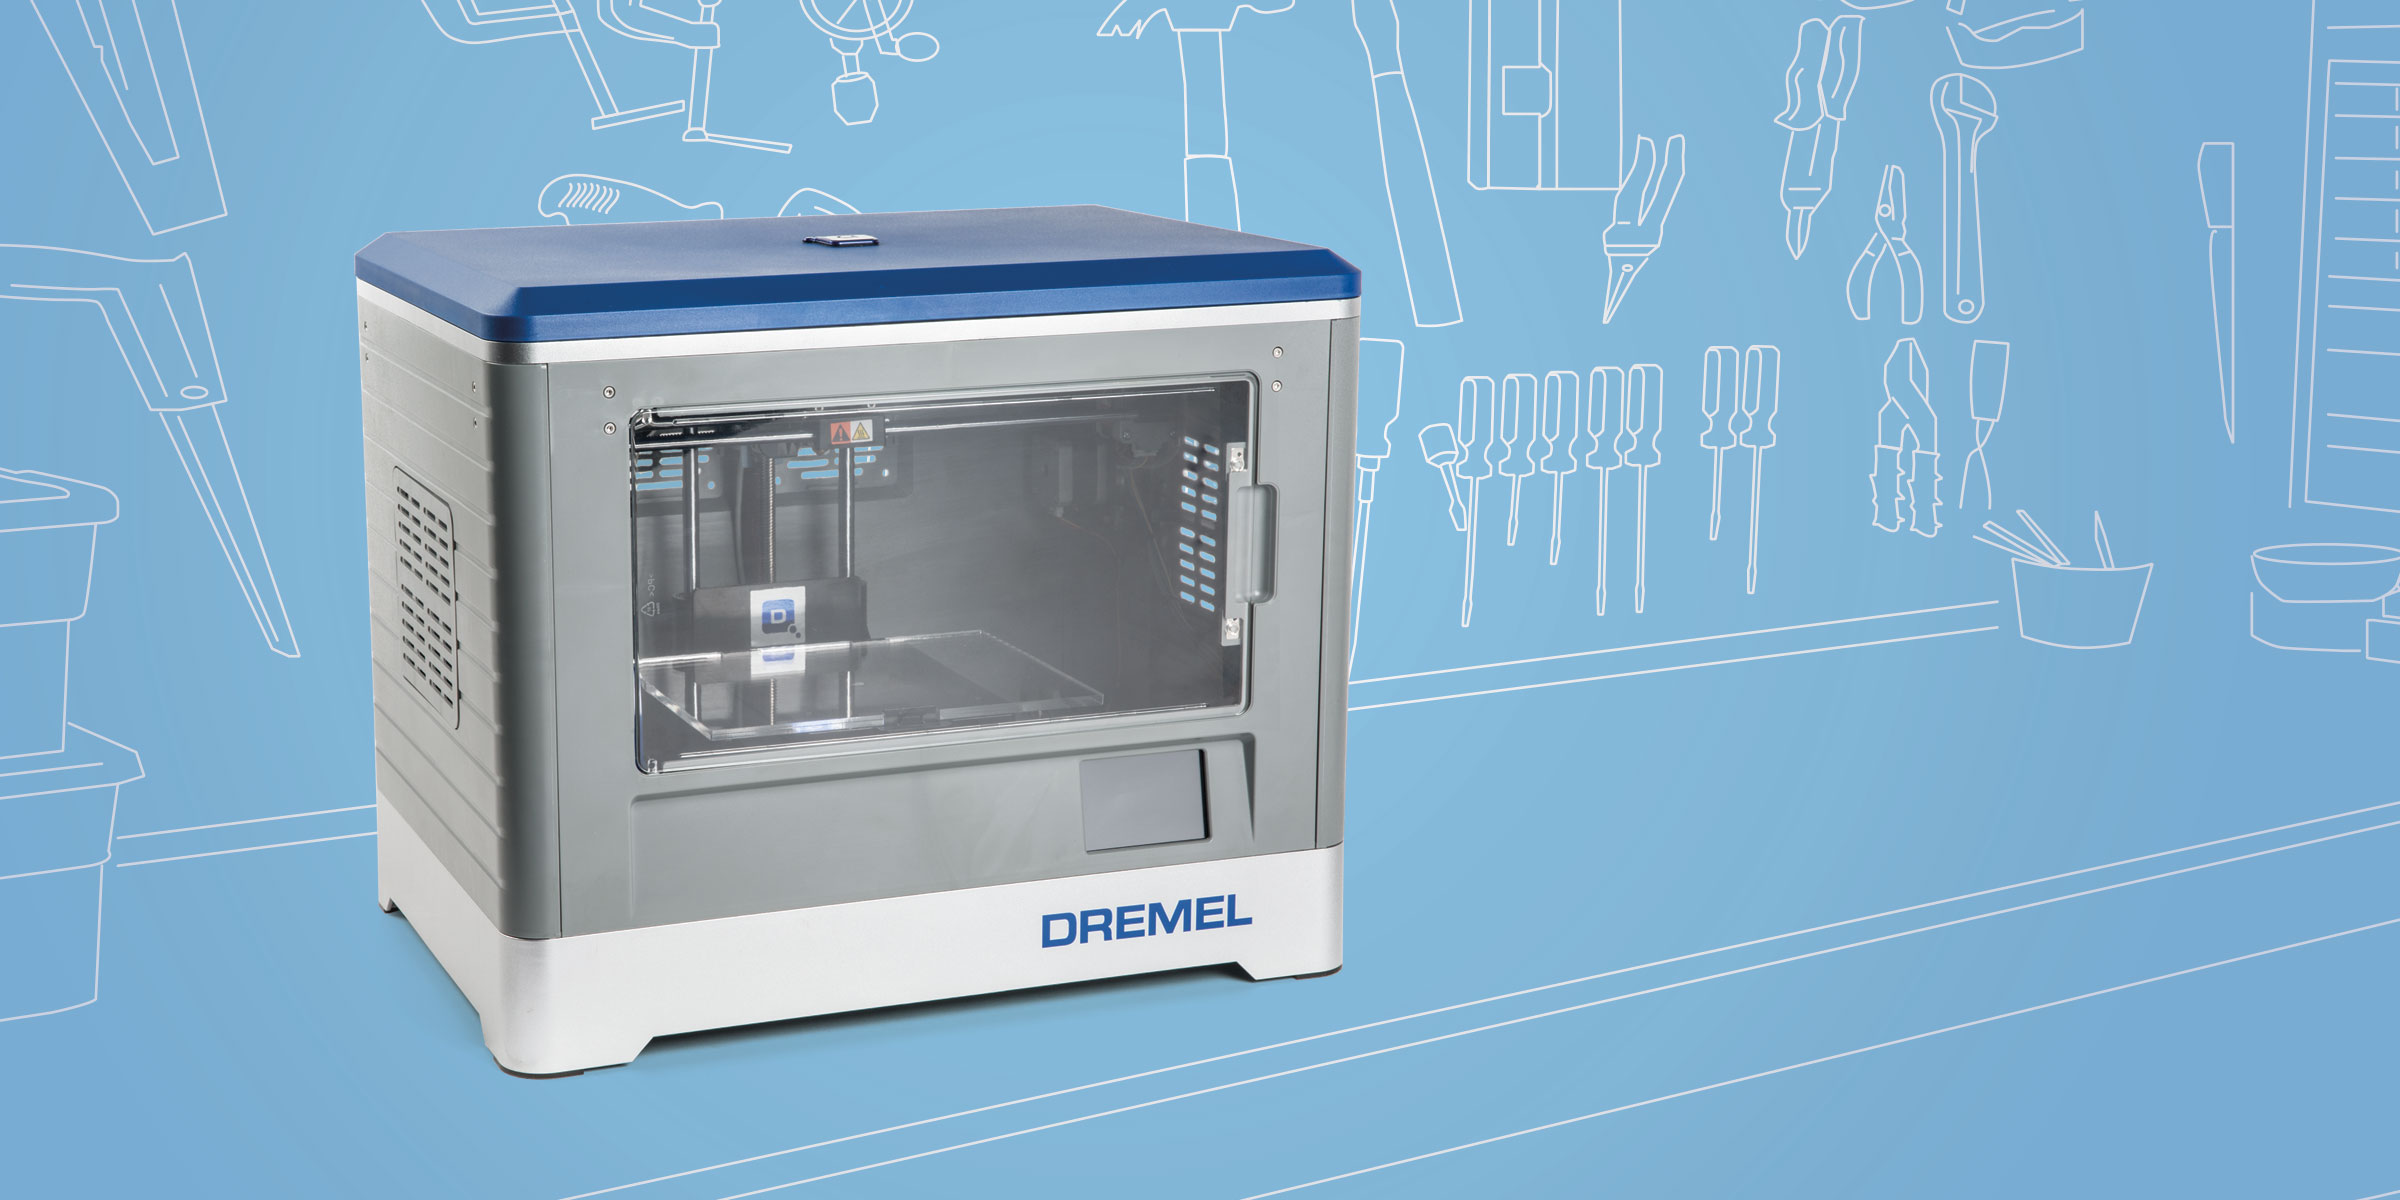 dremel 3d idea builder 3d20 make diy projects and ideas for makers. Black Bedroom Furniture Sets. Home Design Ideas